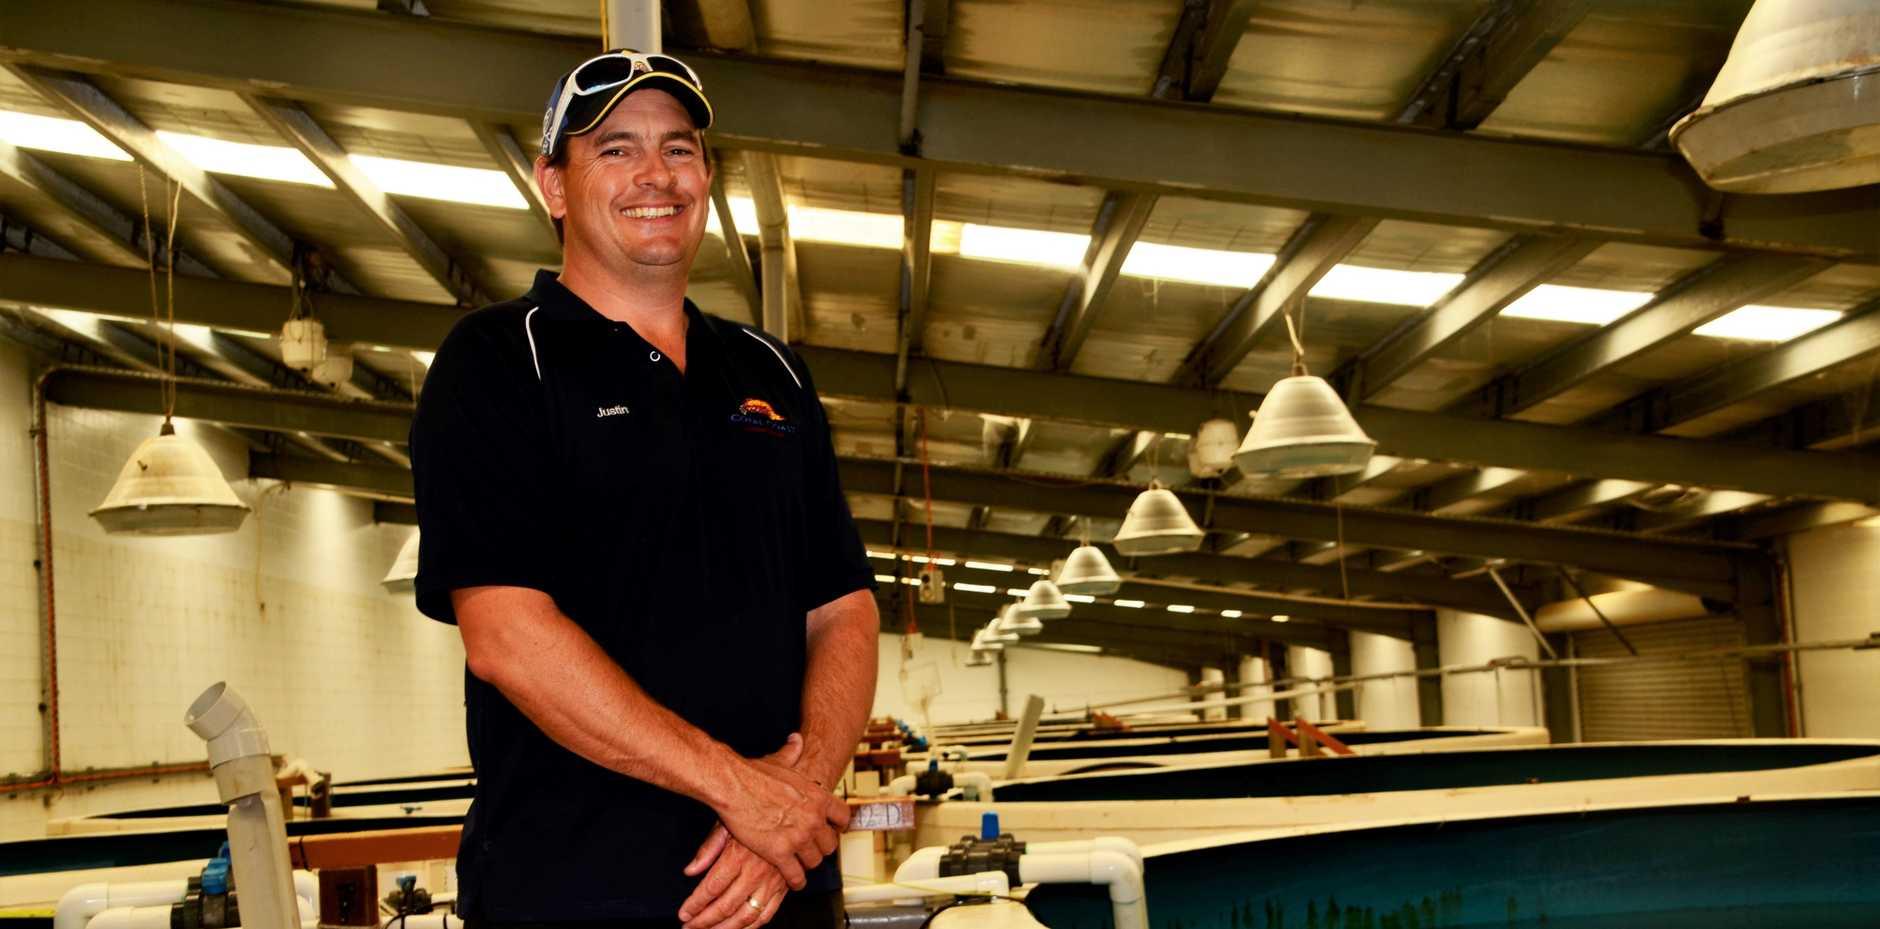 Coral Coast Barramundi farm manager Justin Forrester. Photo: Mikayla Mayoh